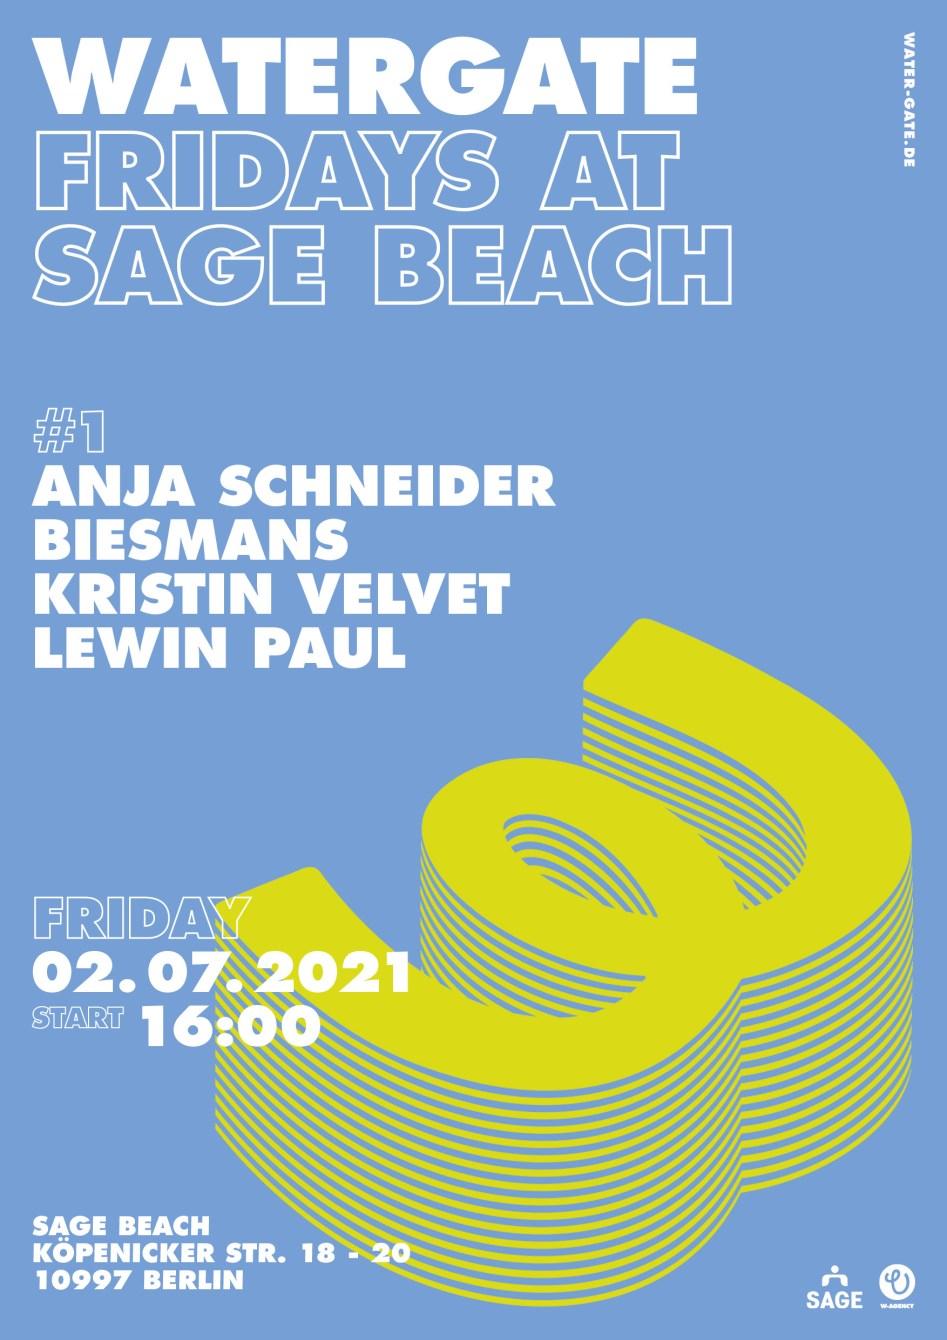 Watergate Fridays at Sage Beach - Flyer front